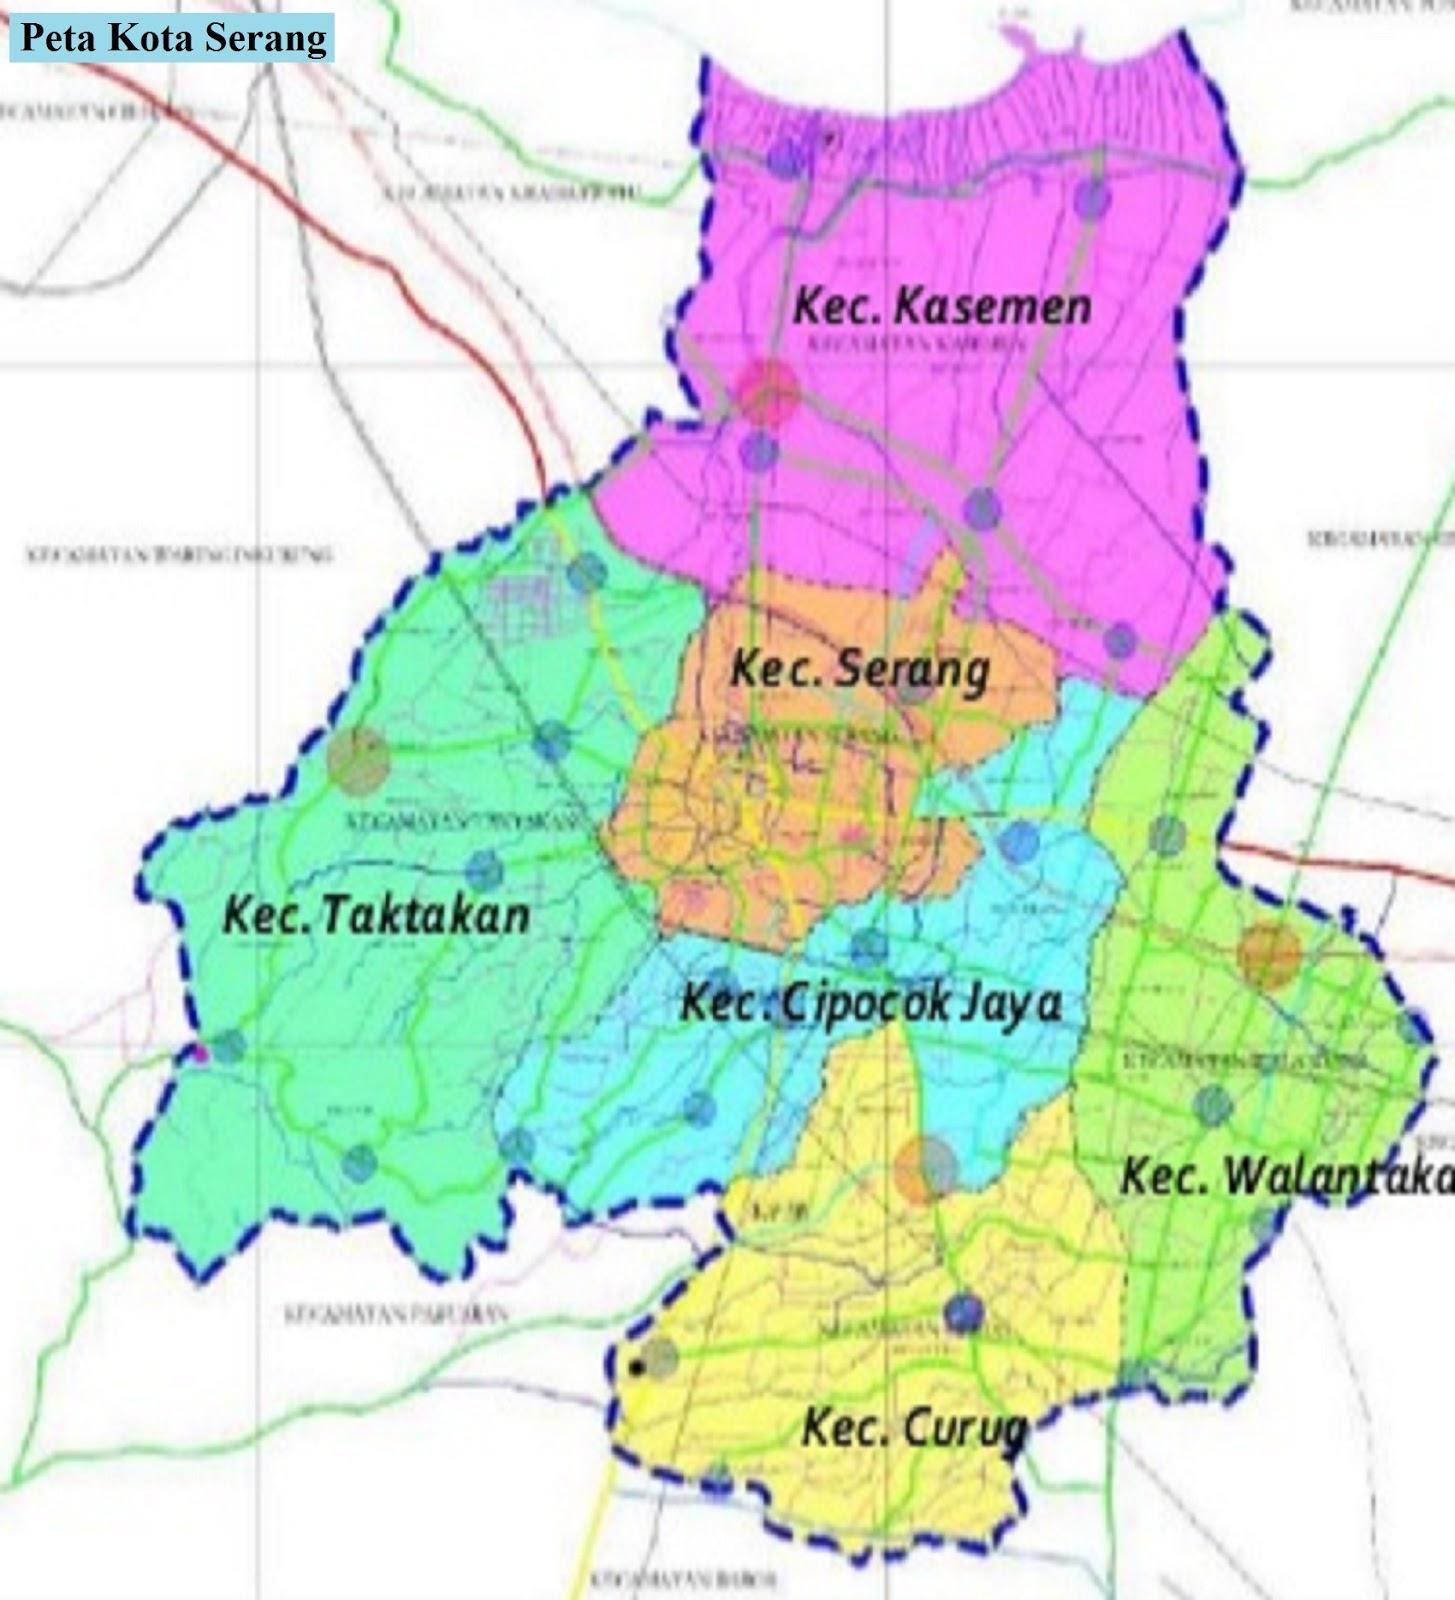 Peta Kota Serang